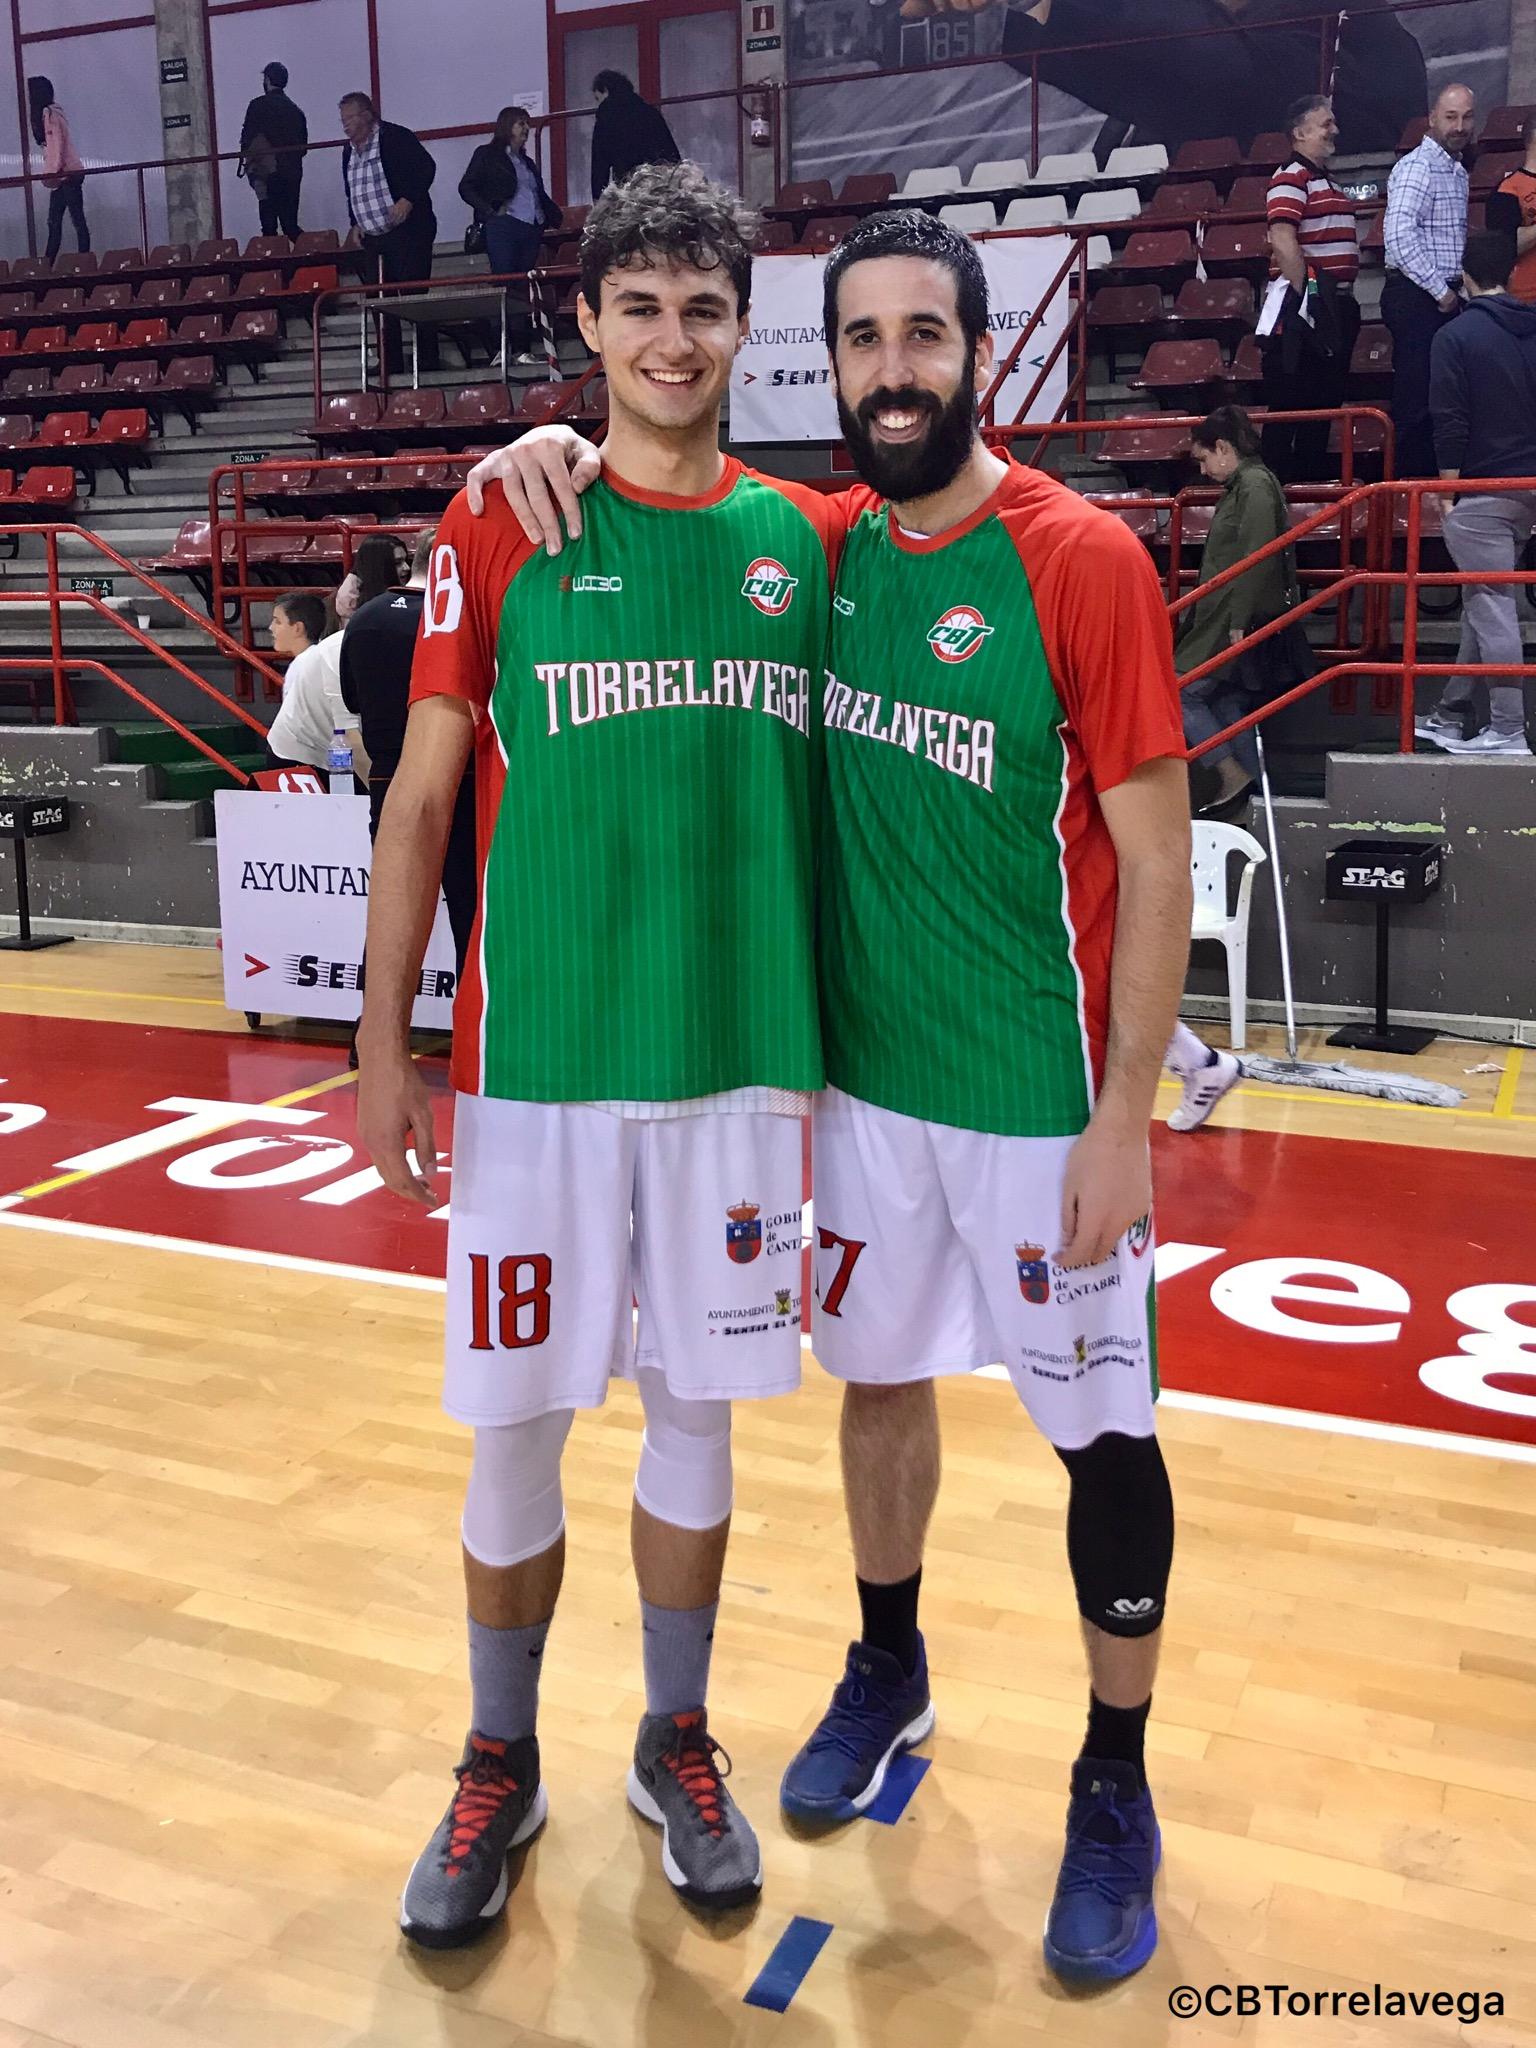 Pablo Ricciardiello y Jorge Urtiaga - CBT Torrelavega A